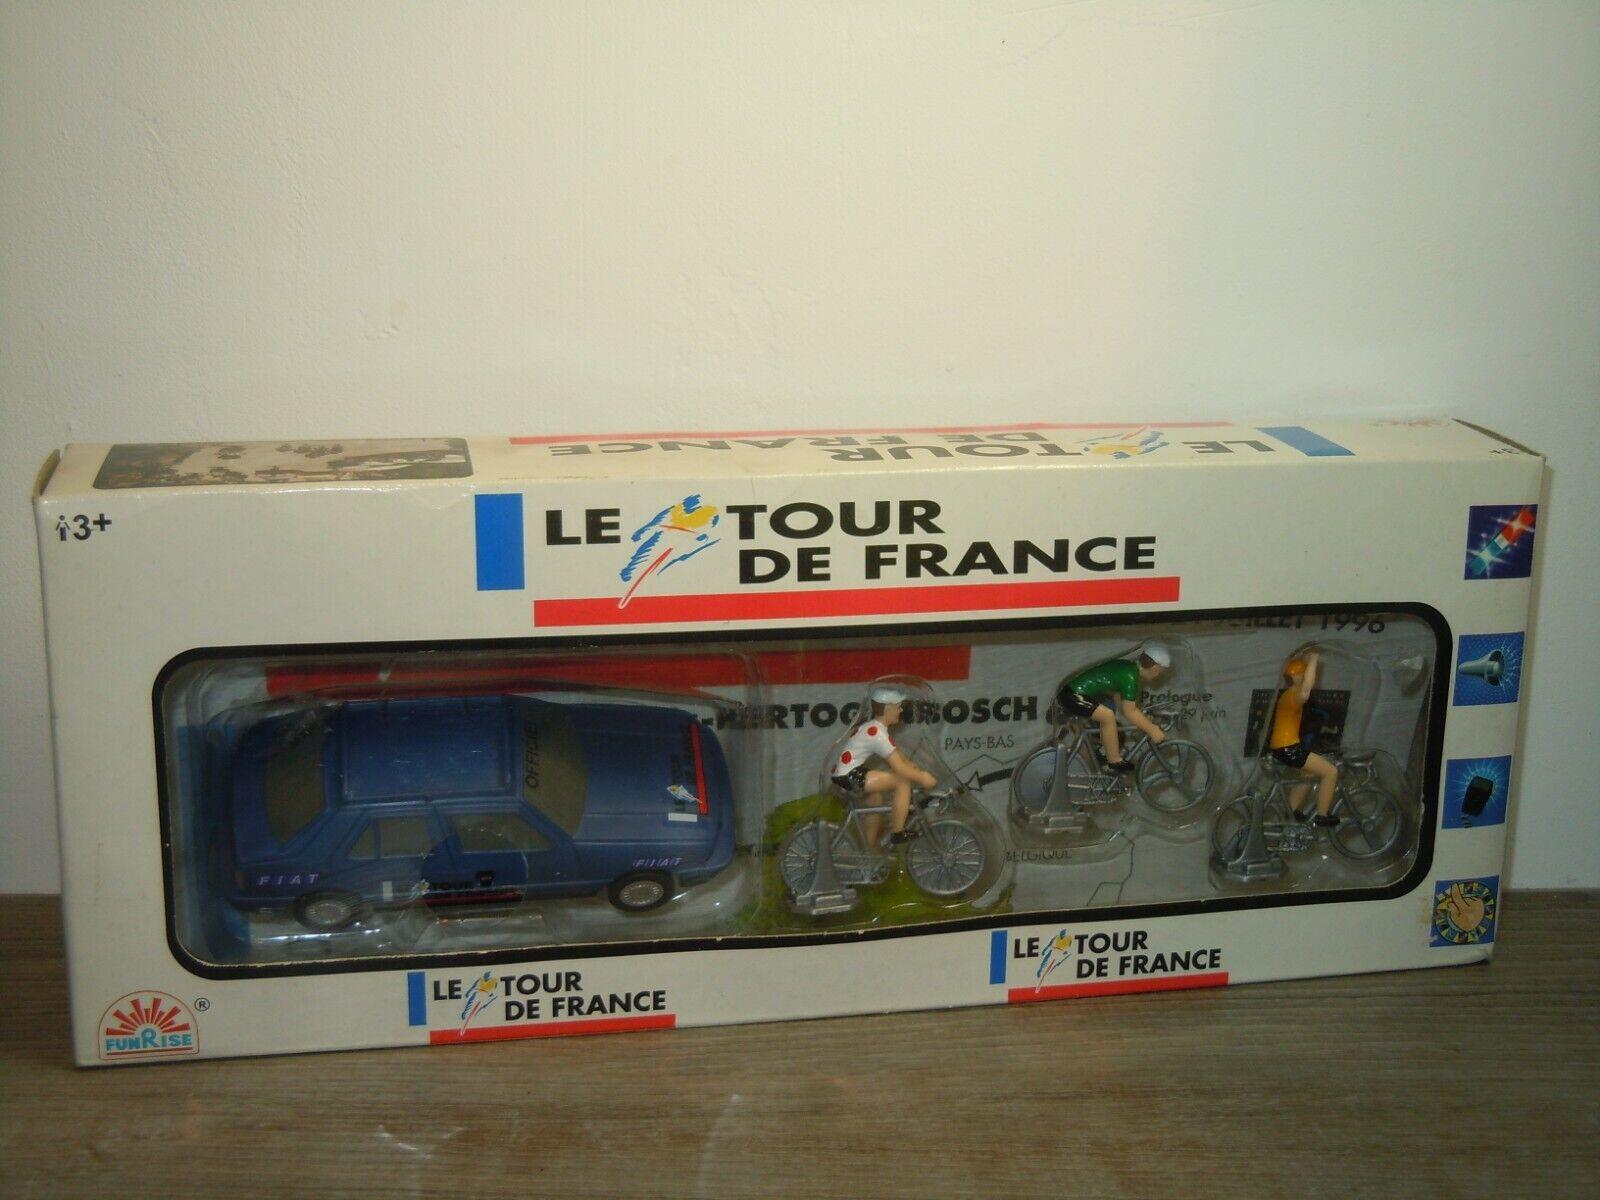 mas barato Le Le Le Tour de France 1996 Set - Fiat Croma & 3 Bicycler - Funrise - in Box 39103  disfrutando de sus compras